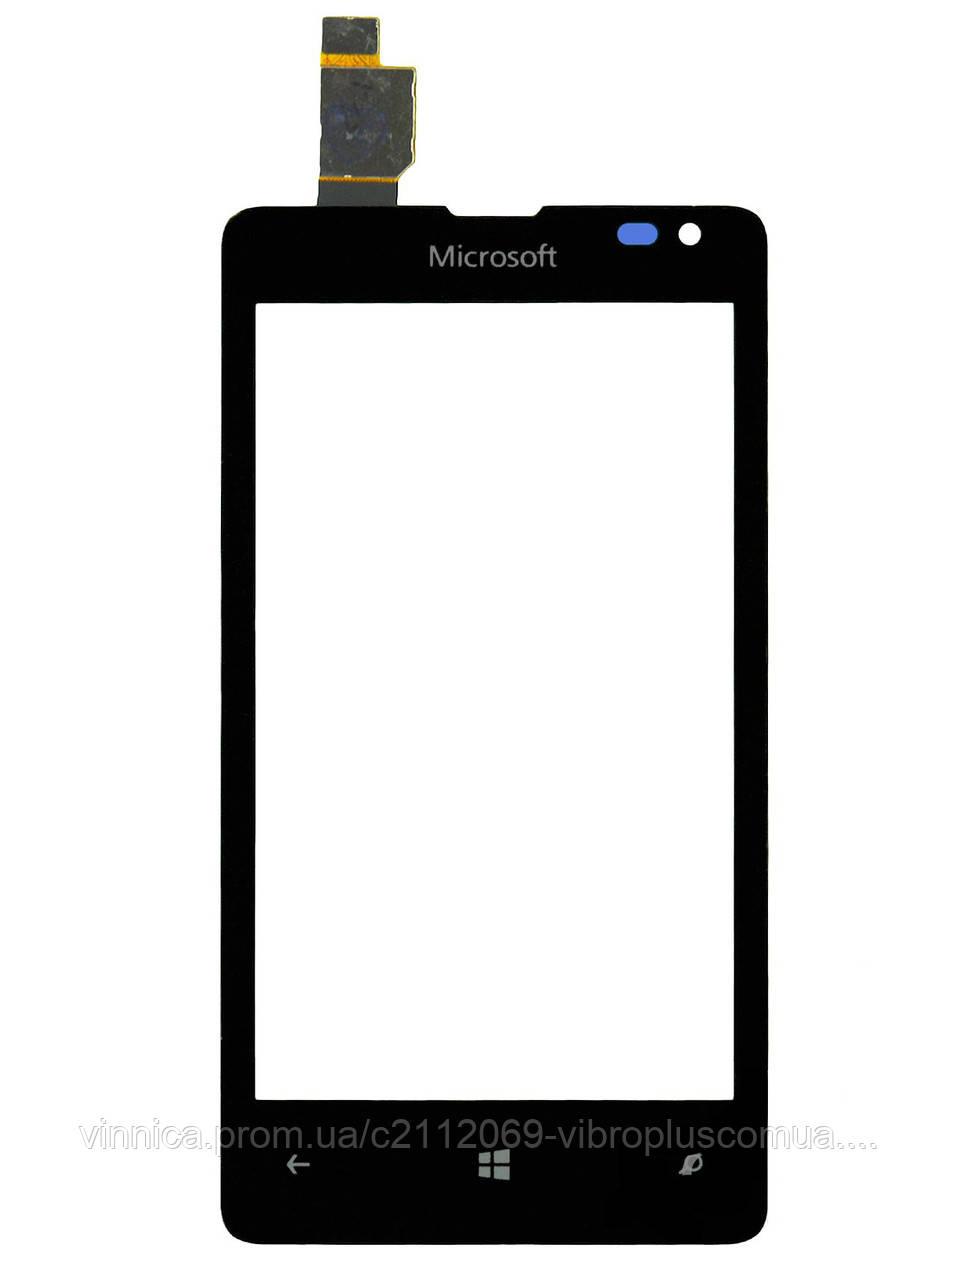 Тачскрин (сенсор) Microsoft Lumia 435 DS, Lumia 532 (RM-1069) h/c, black (черный)